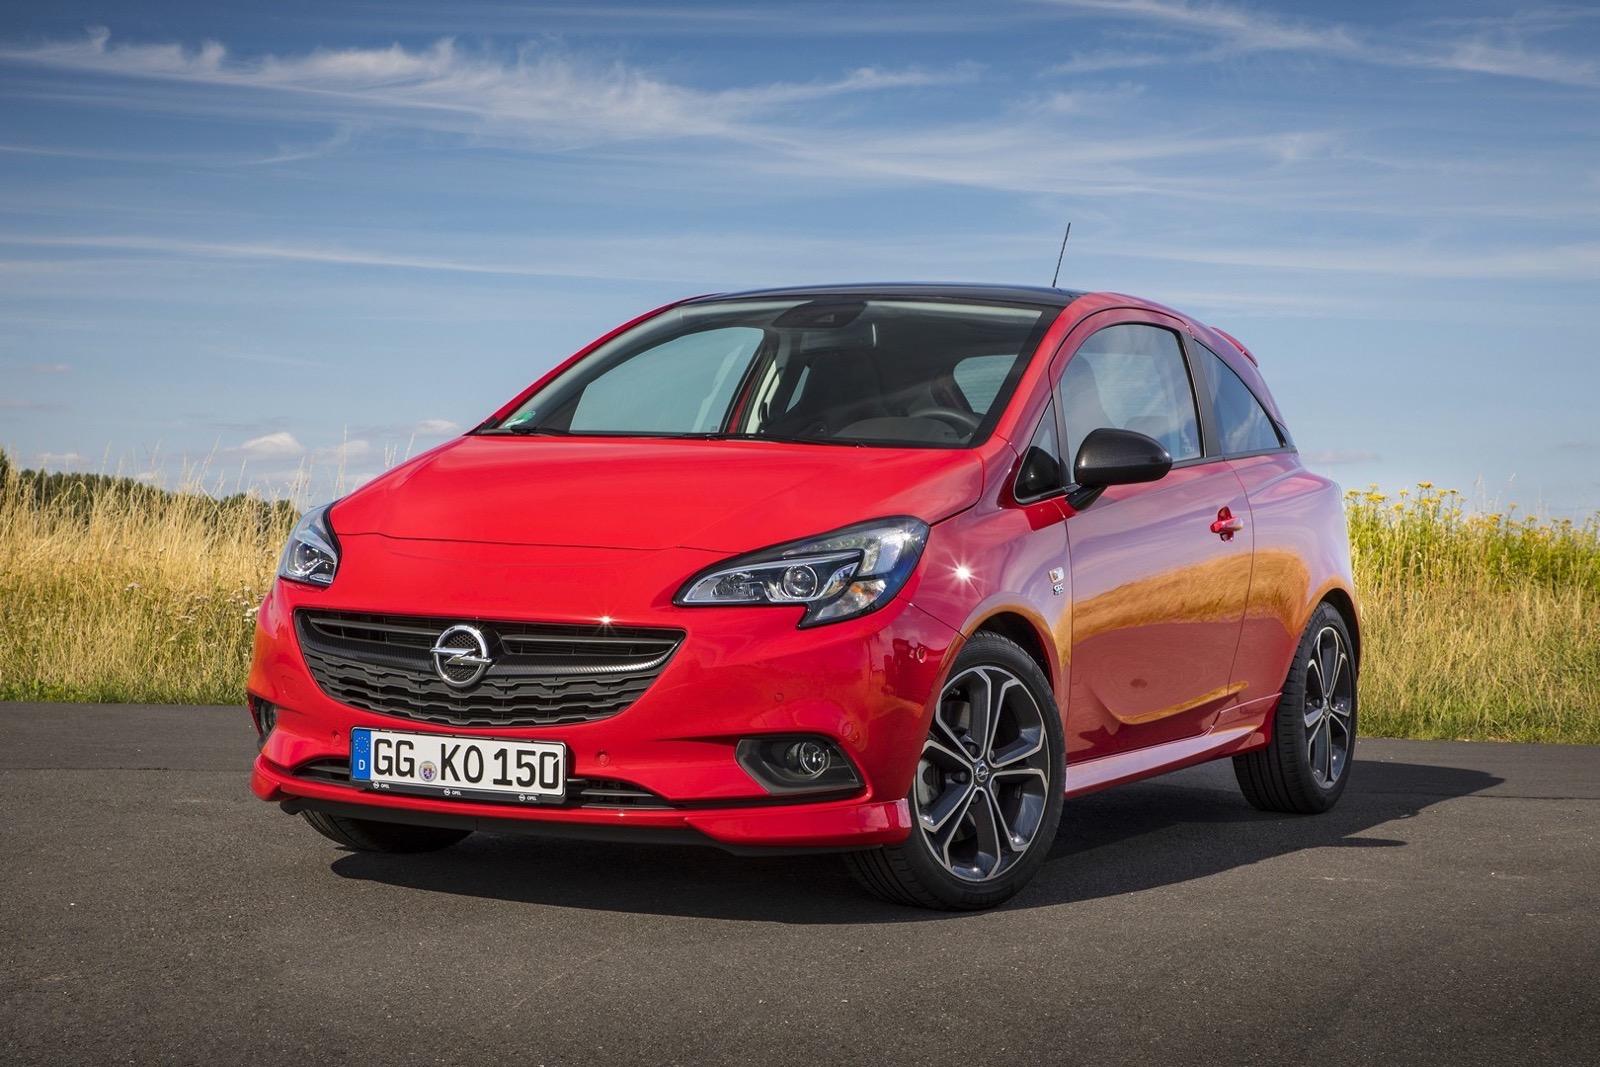 Opel_Corsa_S_01